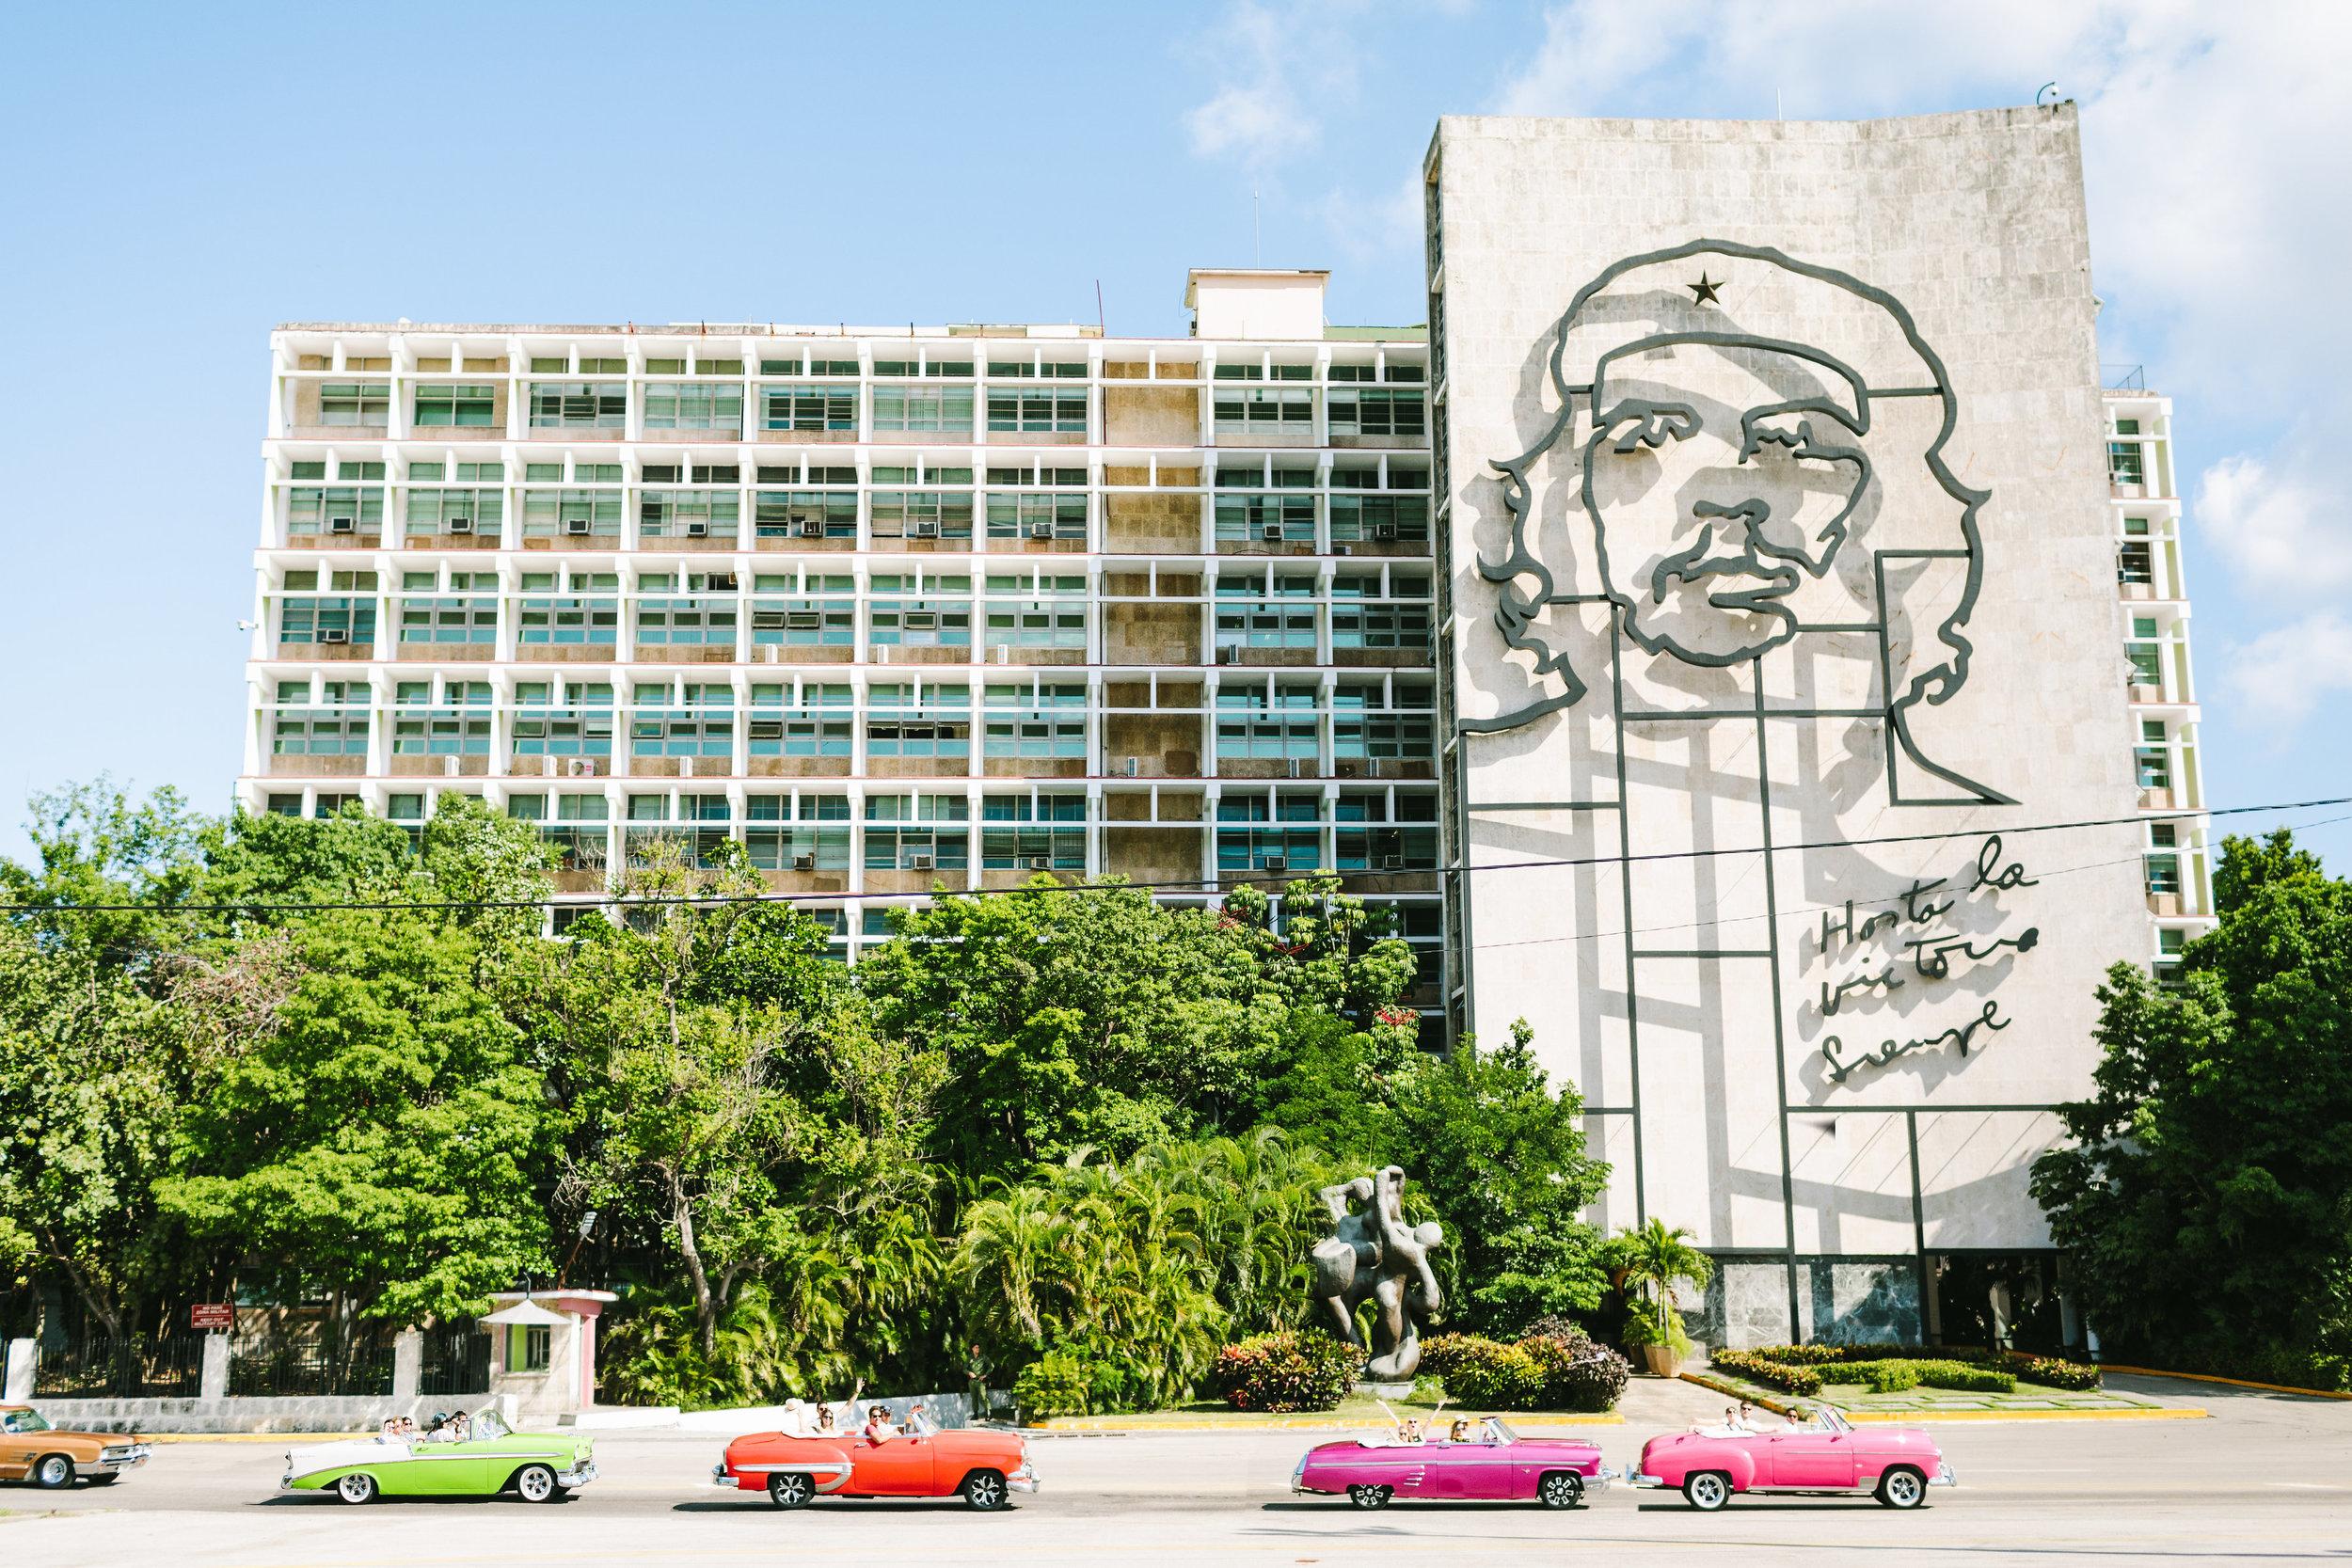 Cuba-Day2-JodeeDebesPhotography-225.jpg